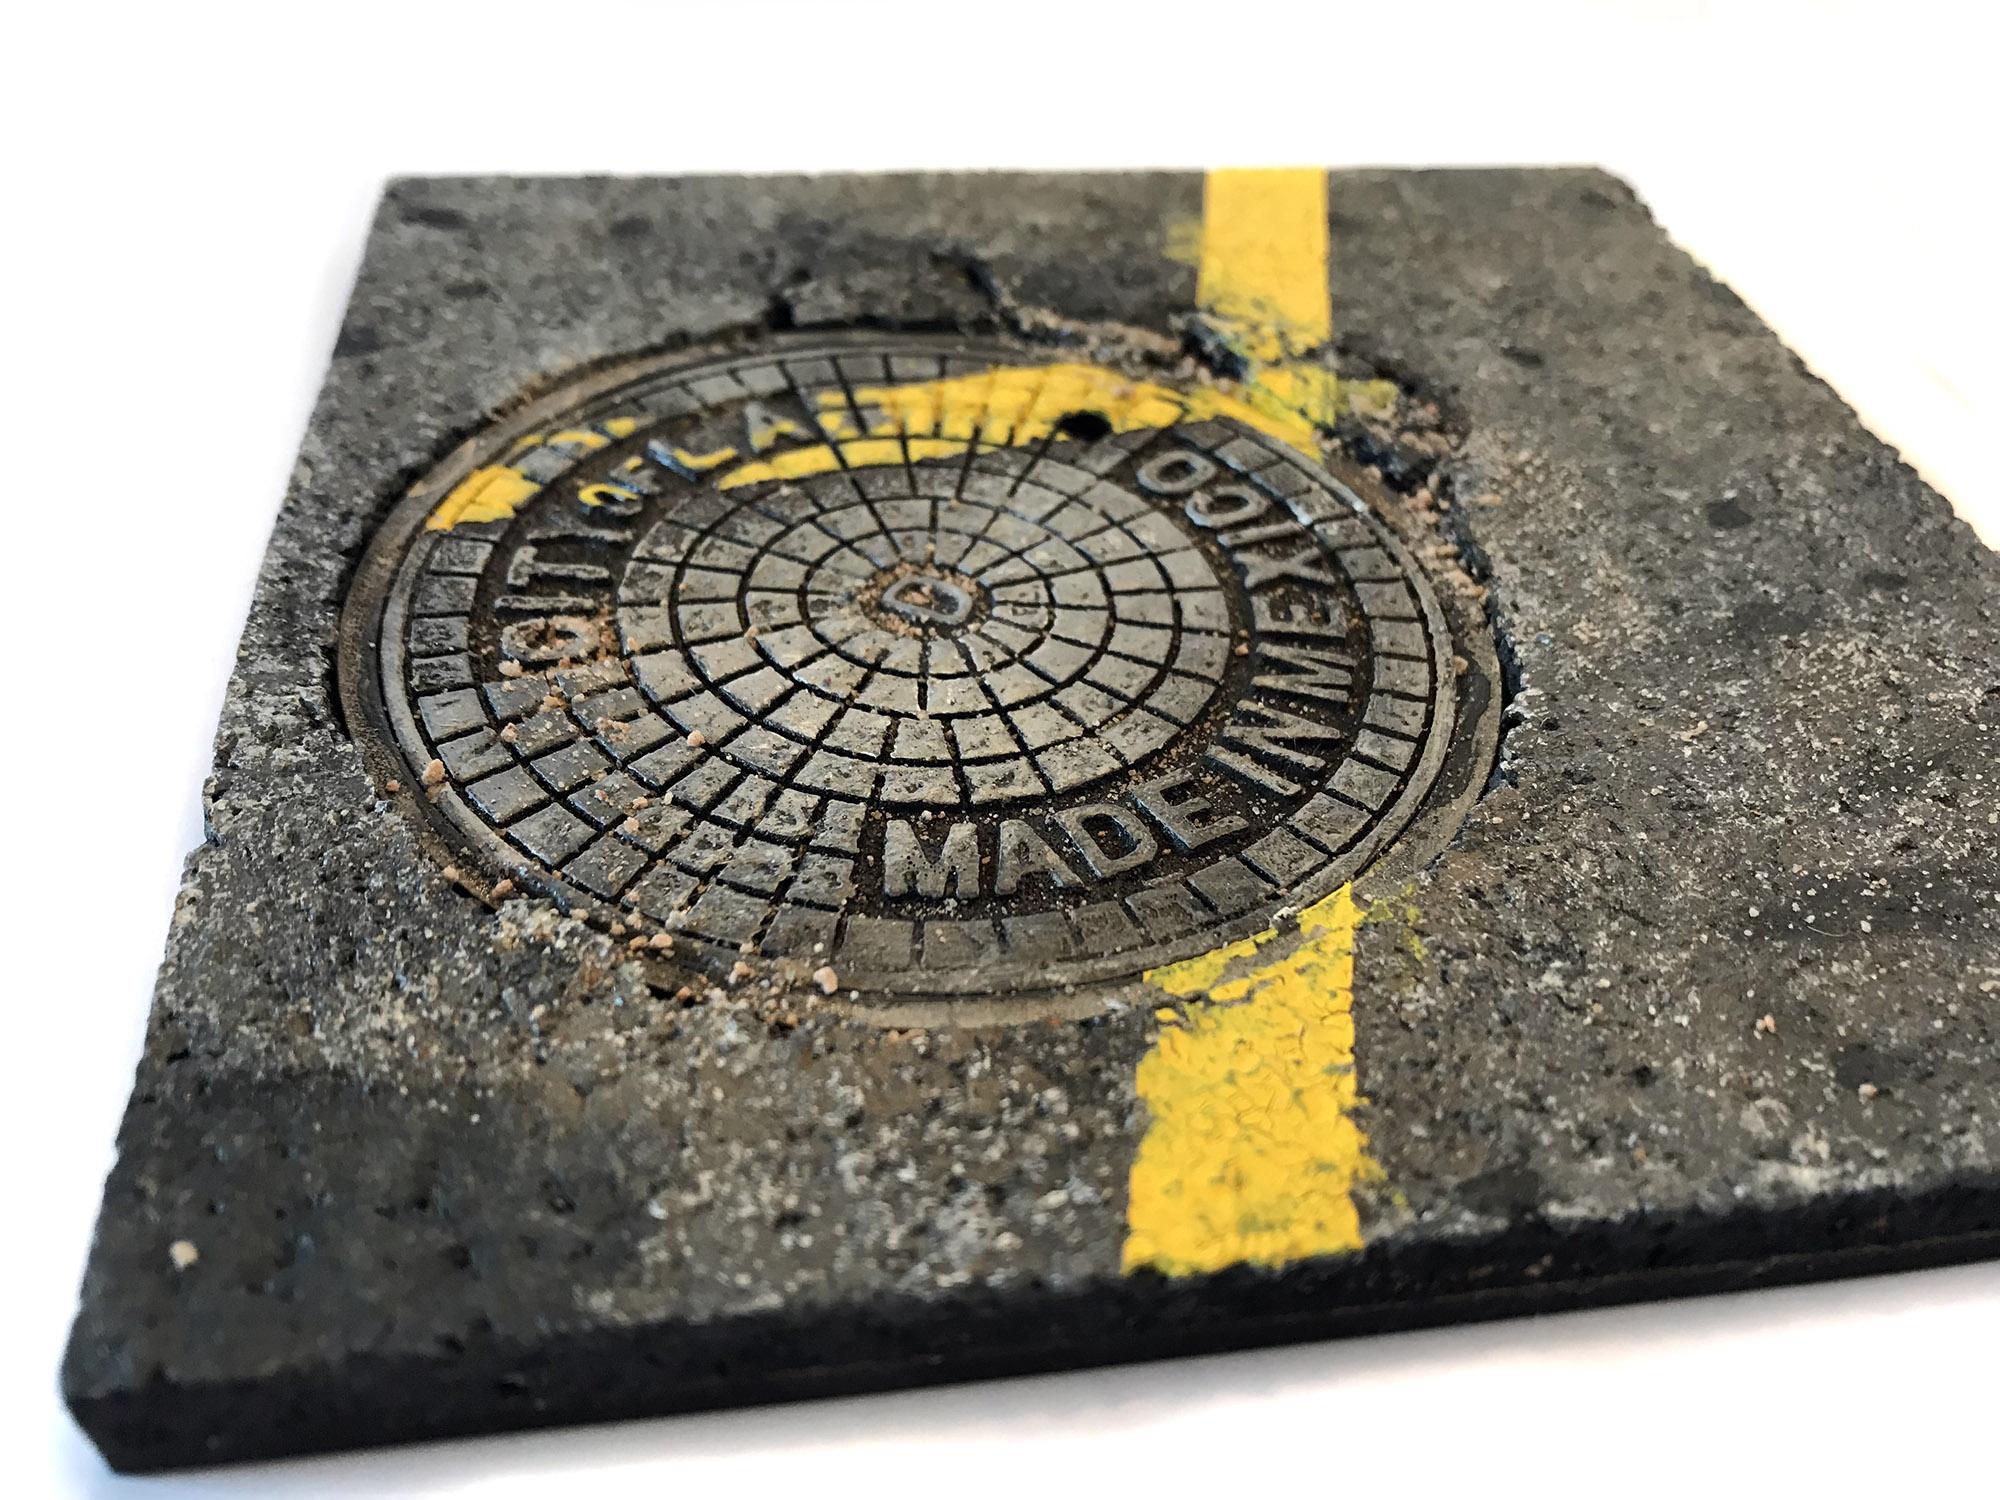 los angeles manhole cover.jpg